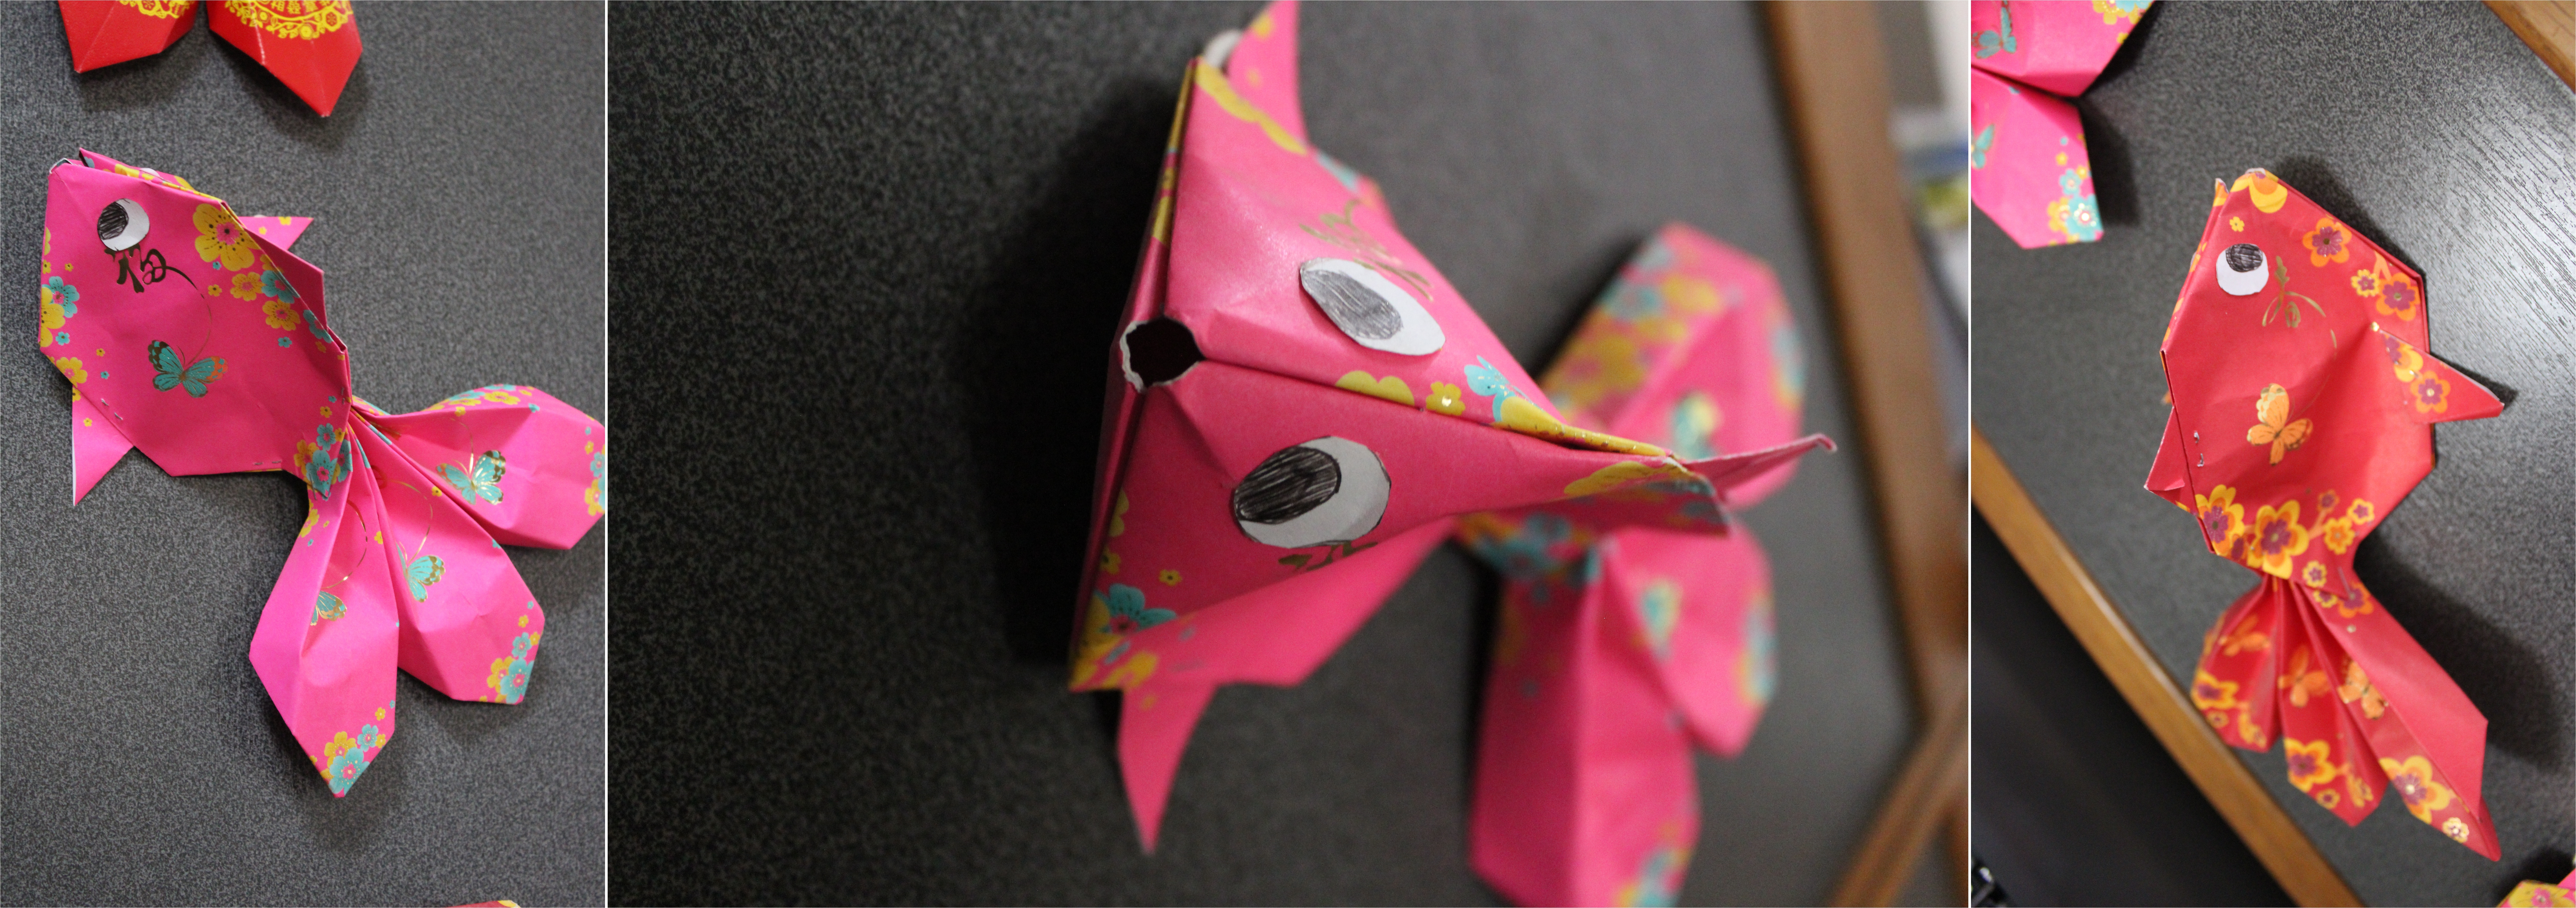 Origami - Wikipedia   3458x9814